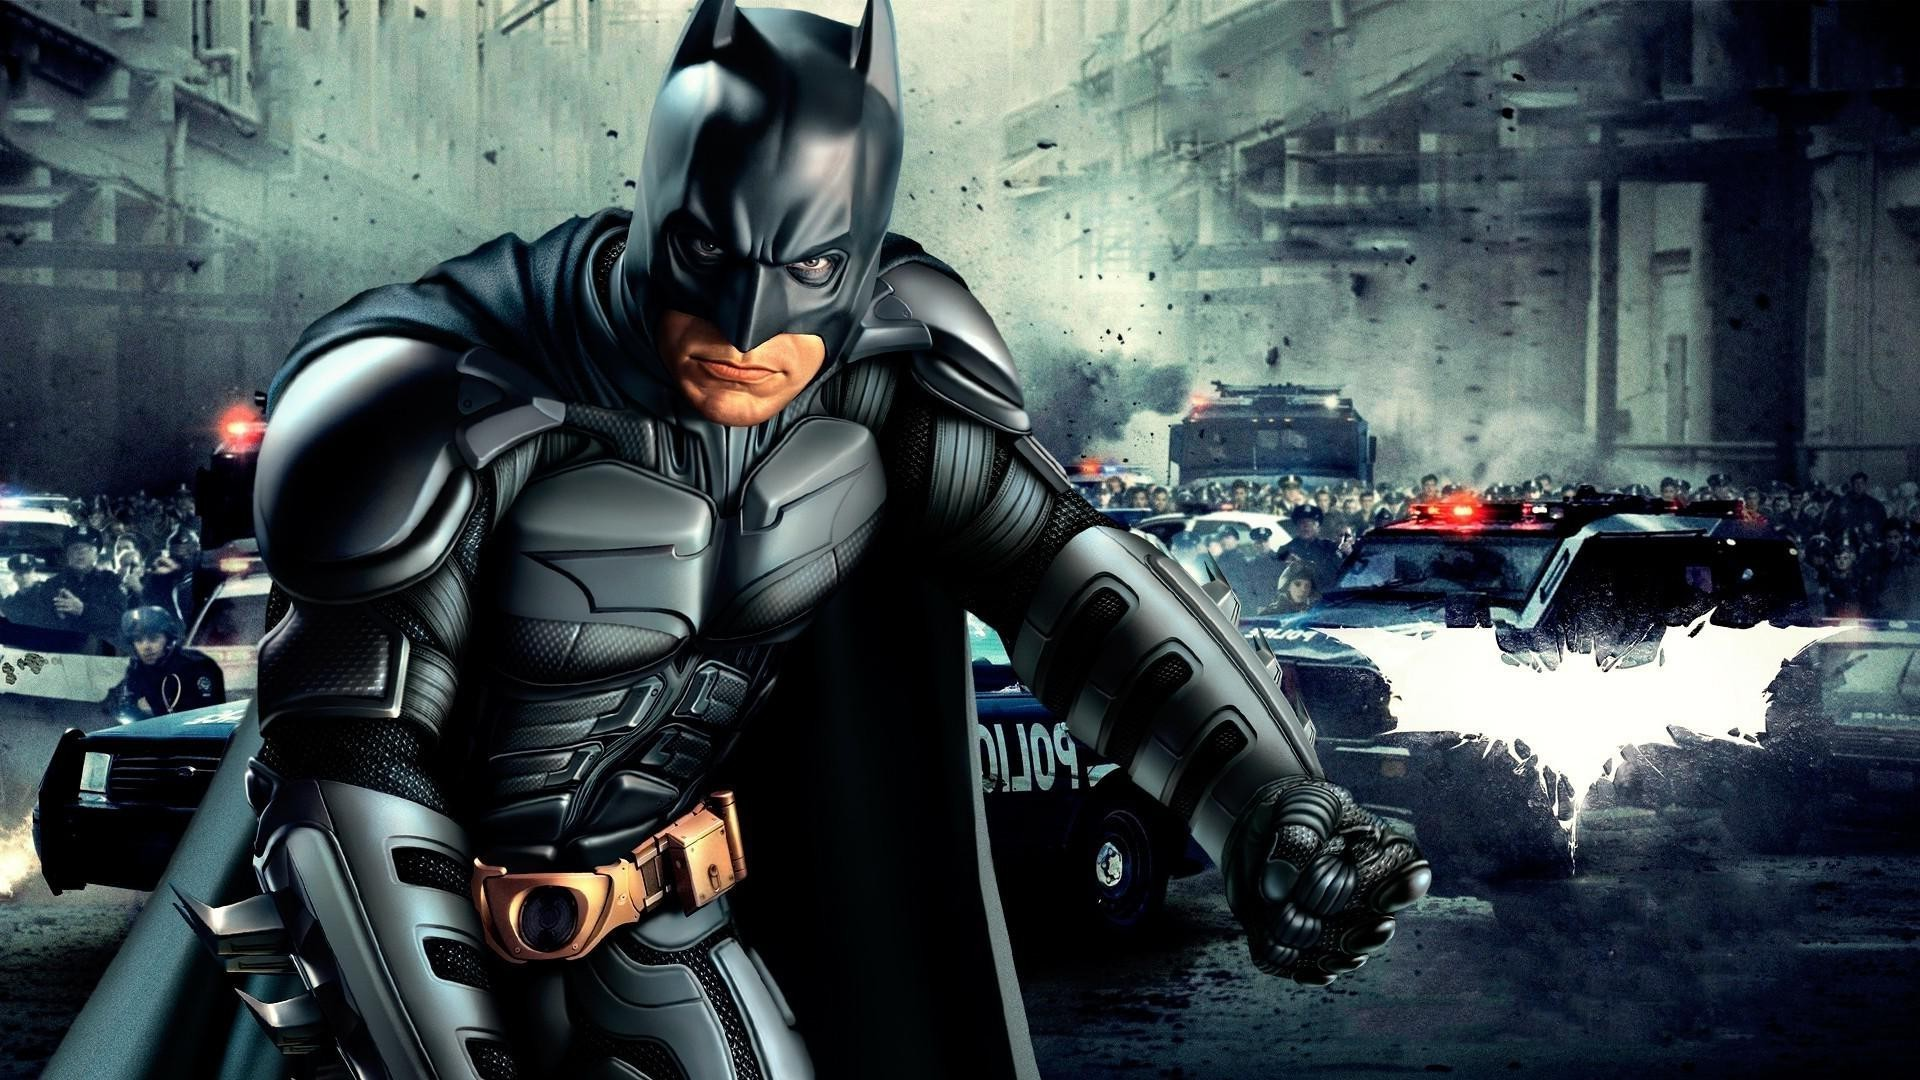 The Dark Knight Rises Wallpaper HD 1920x1080 (79+ images)